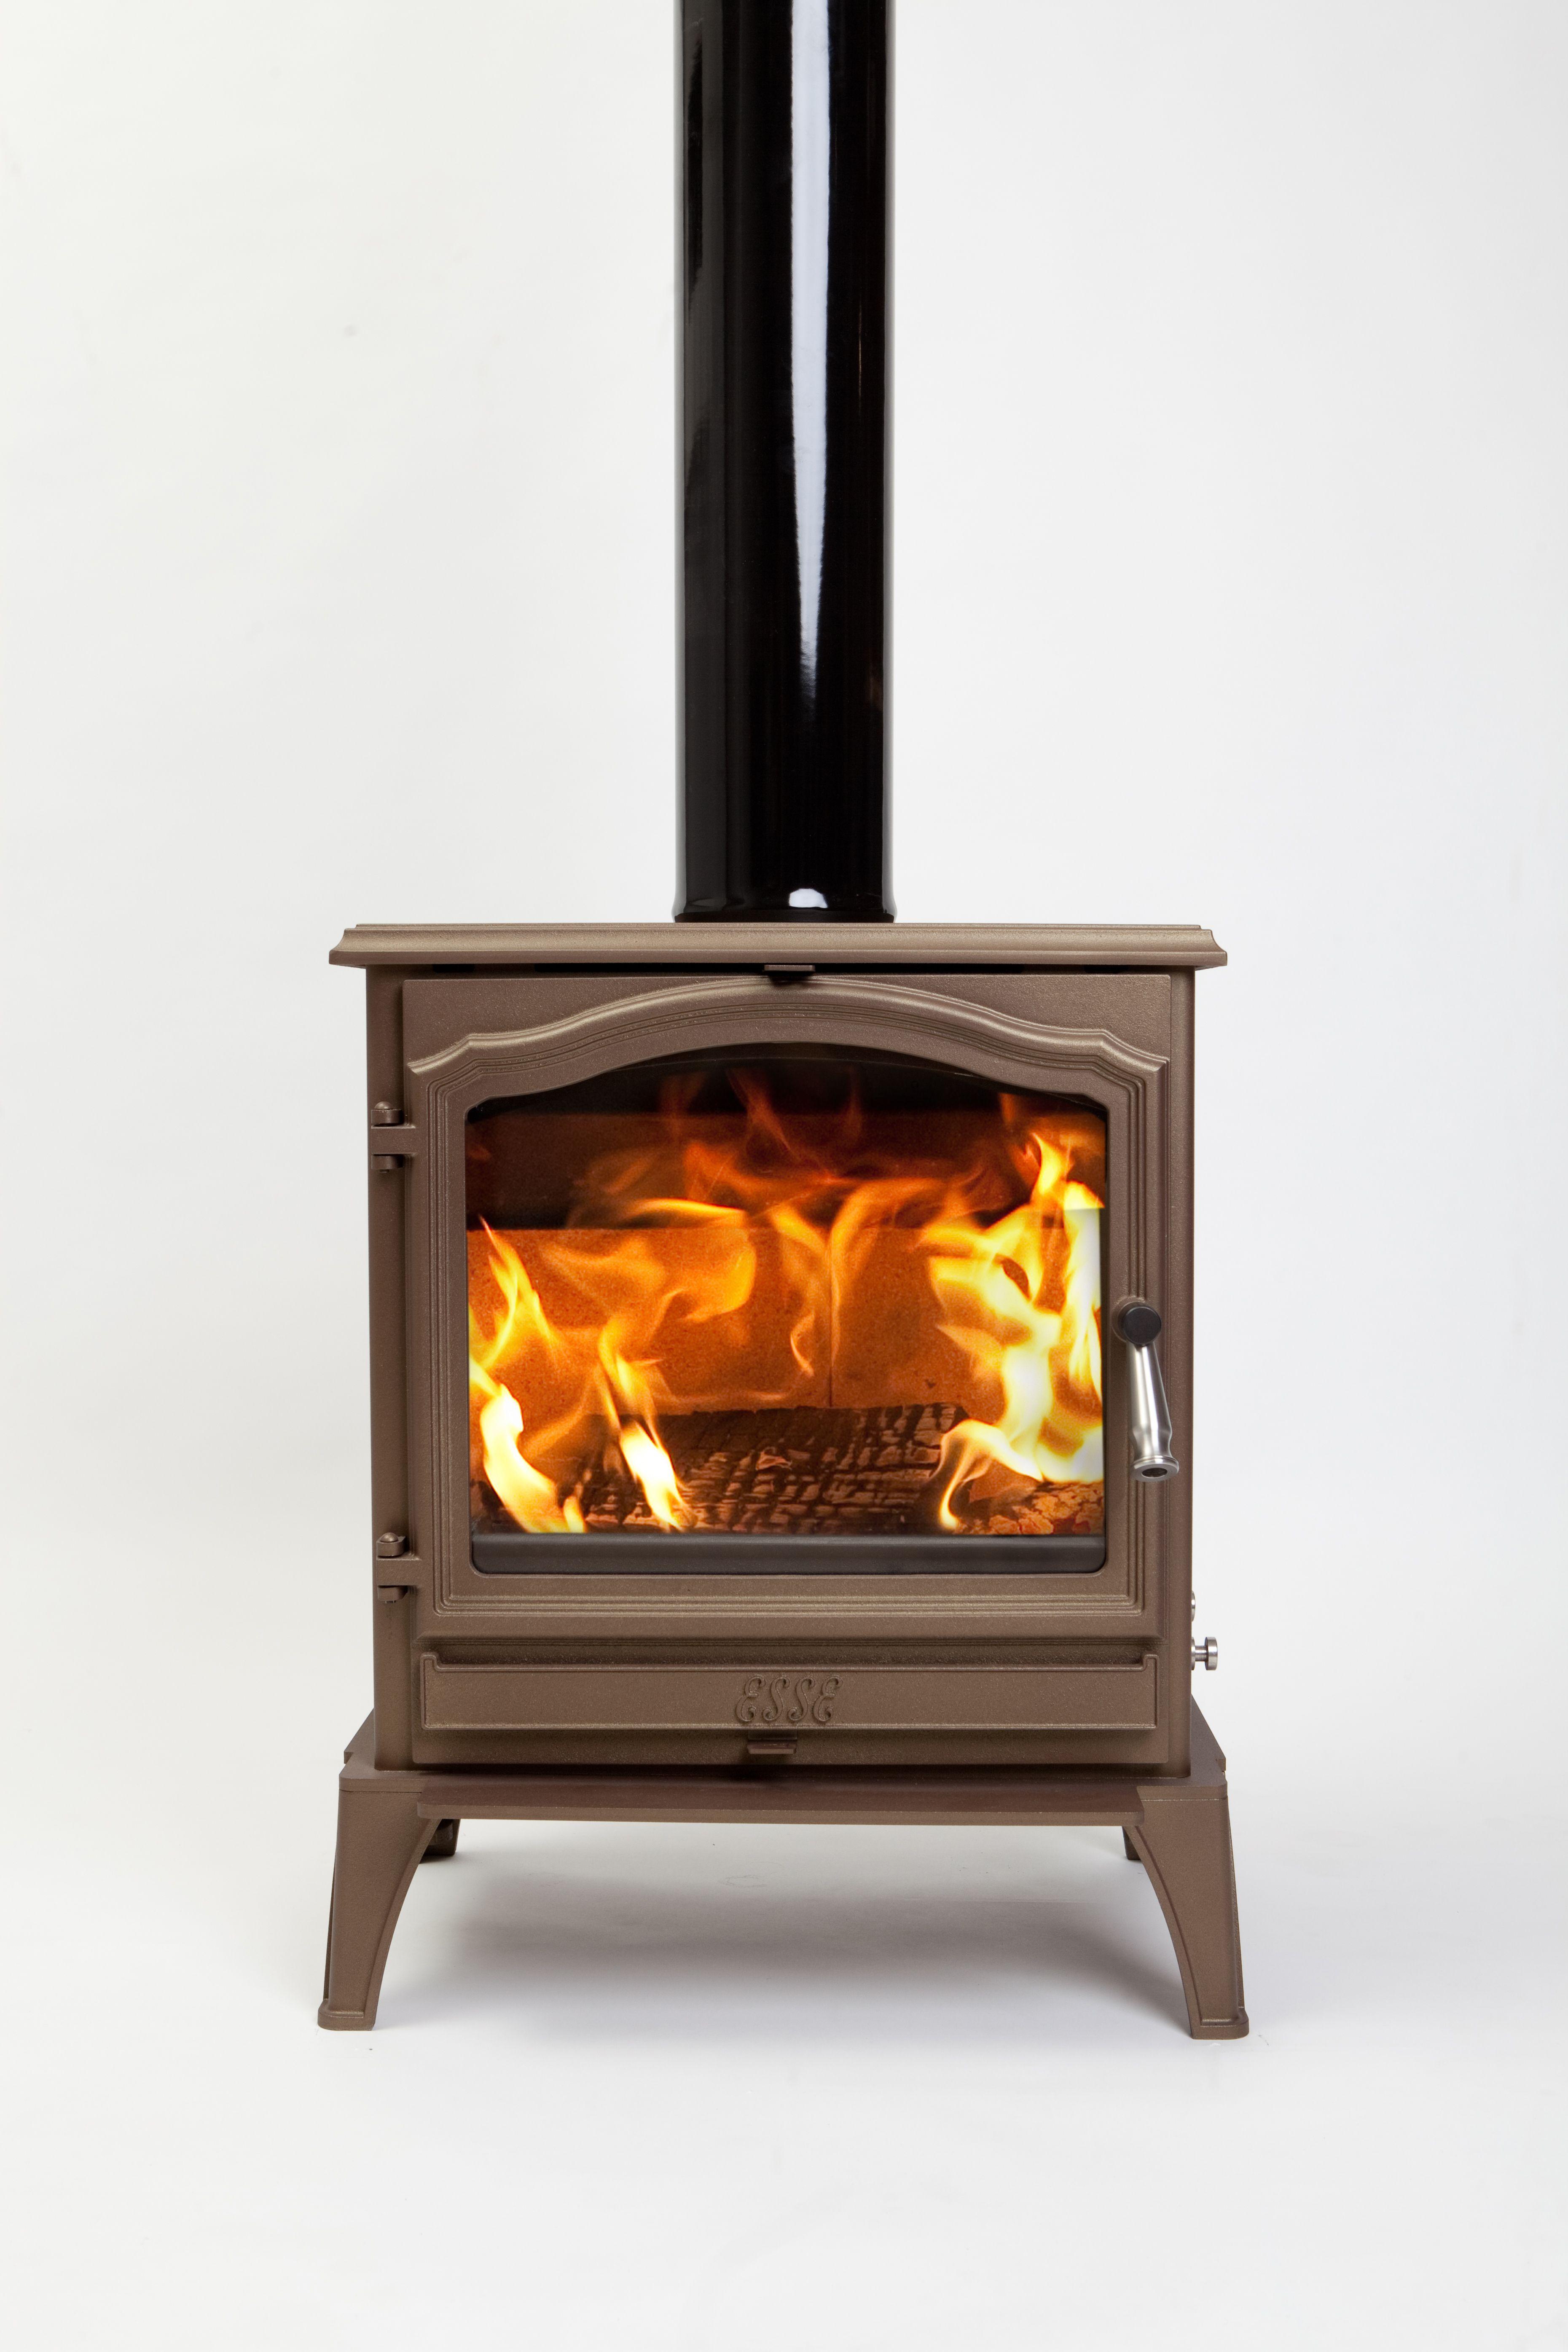 Bronze ESSE 700 10.5kW Multi Fuel Stove | Fireplaces | Pinterest ...